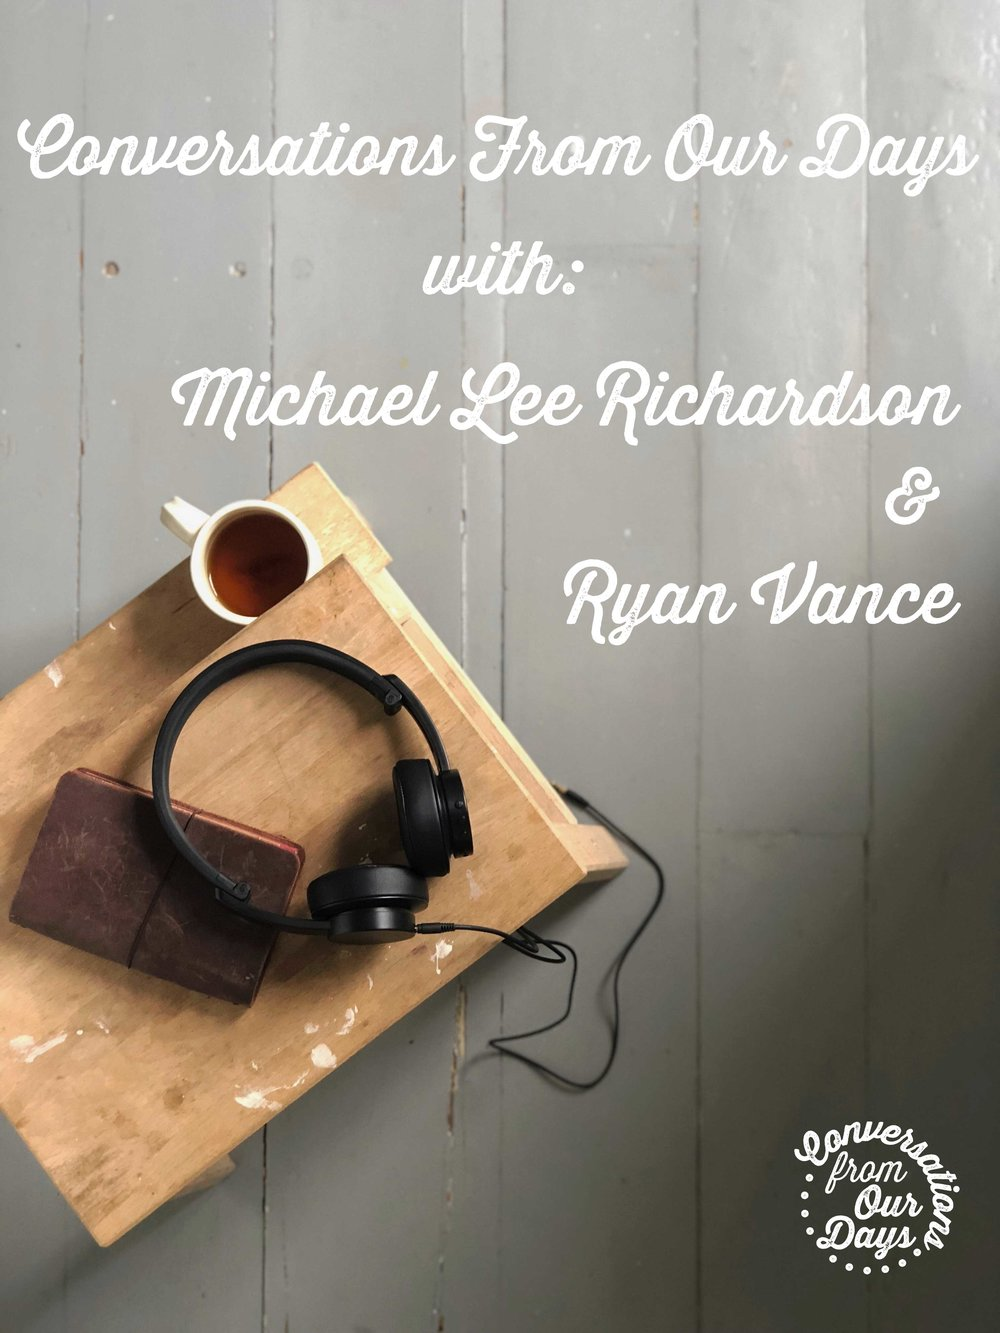 Michael-Lee-Richardson-and-Ryan-Vance.jpg